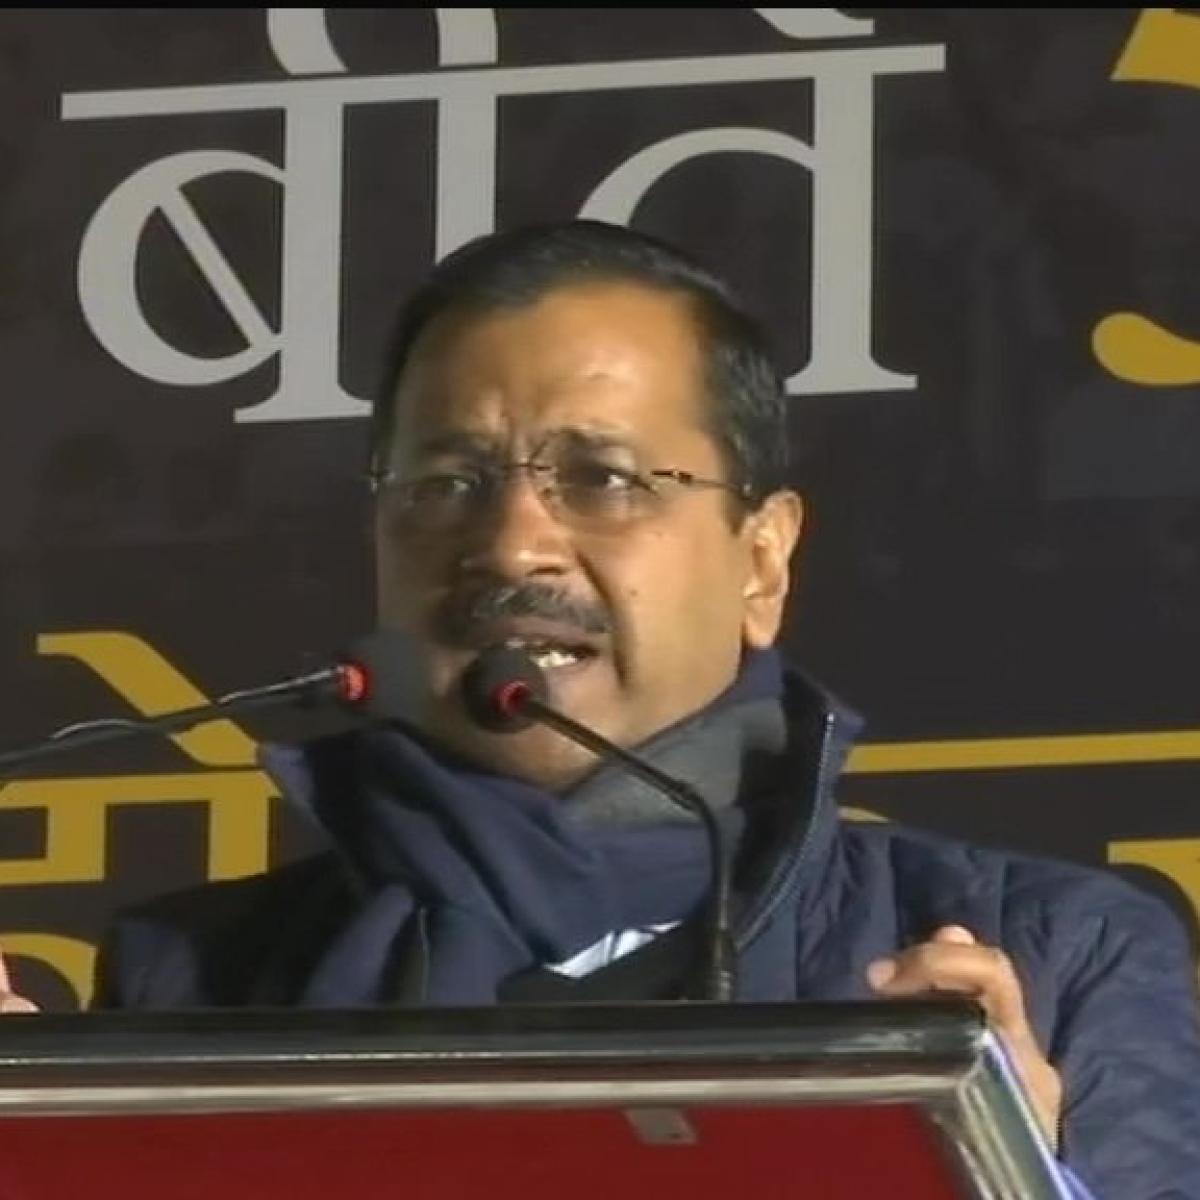 BJP bringing in 'outsiders' for campaigning in Delhi polls: Arvind Kejriwal